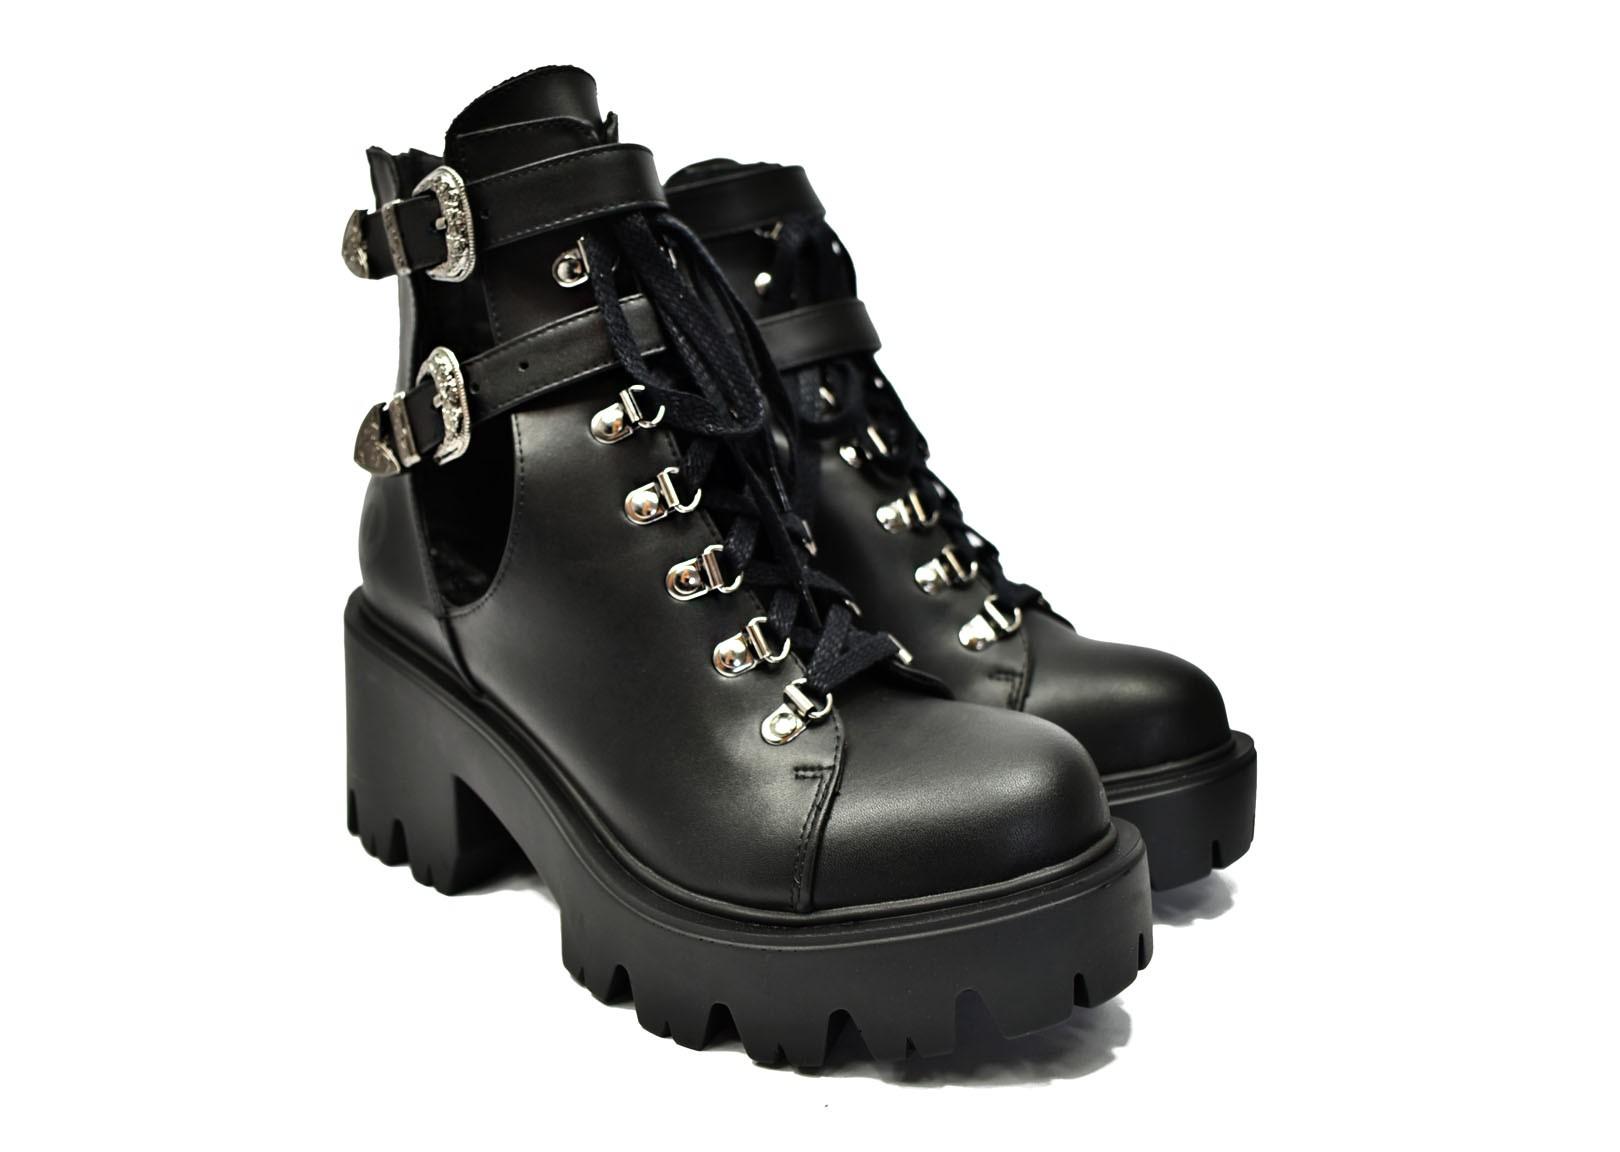 Bottines véganes | ALTERCORE Sadie Black | avesu chaussures